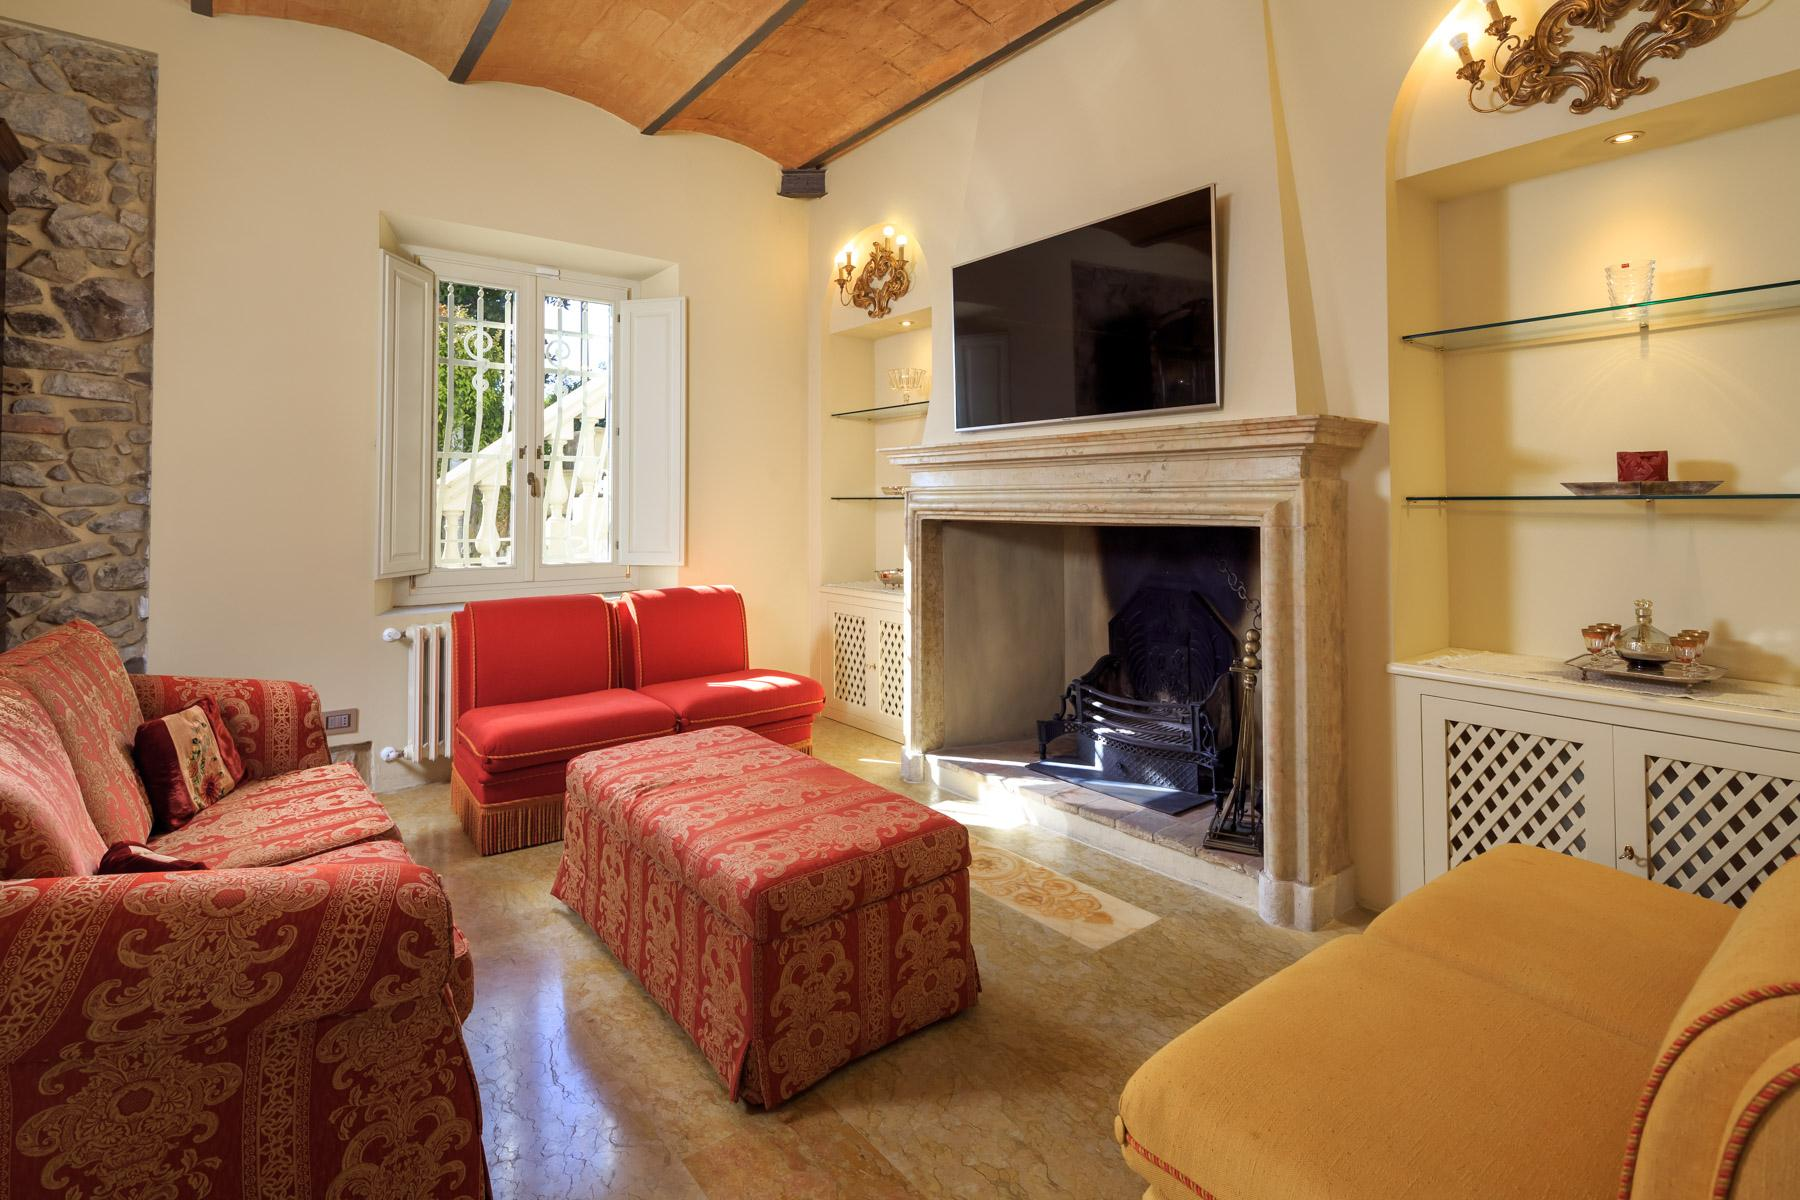 Montecatini Terme小镇优雅的新艺术风格的别墅 - 20